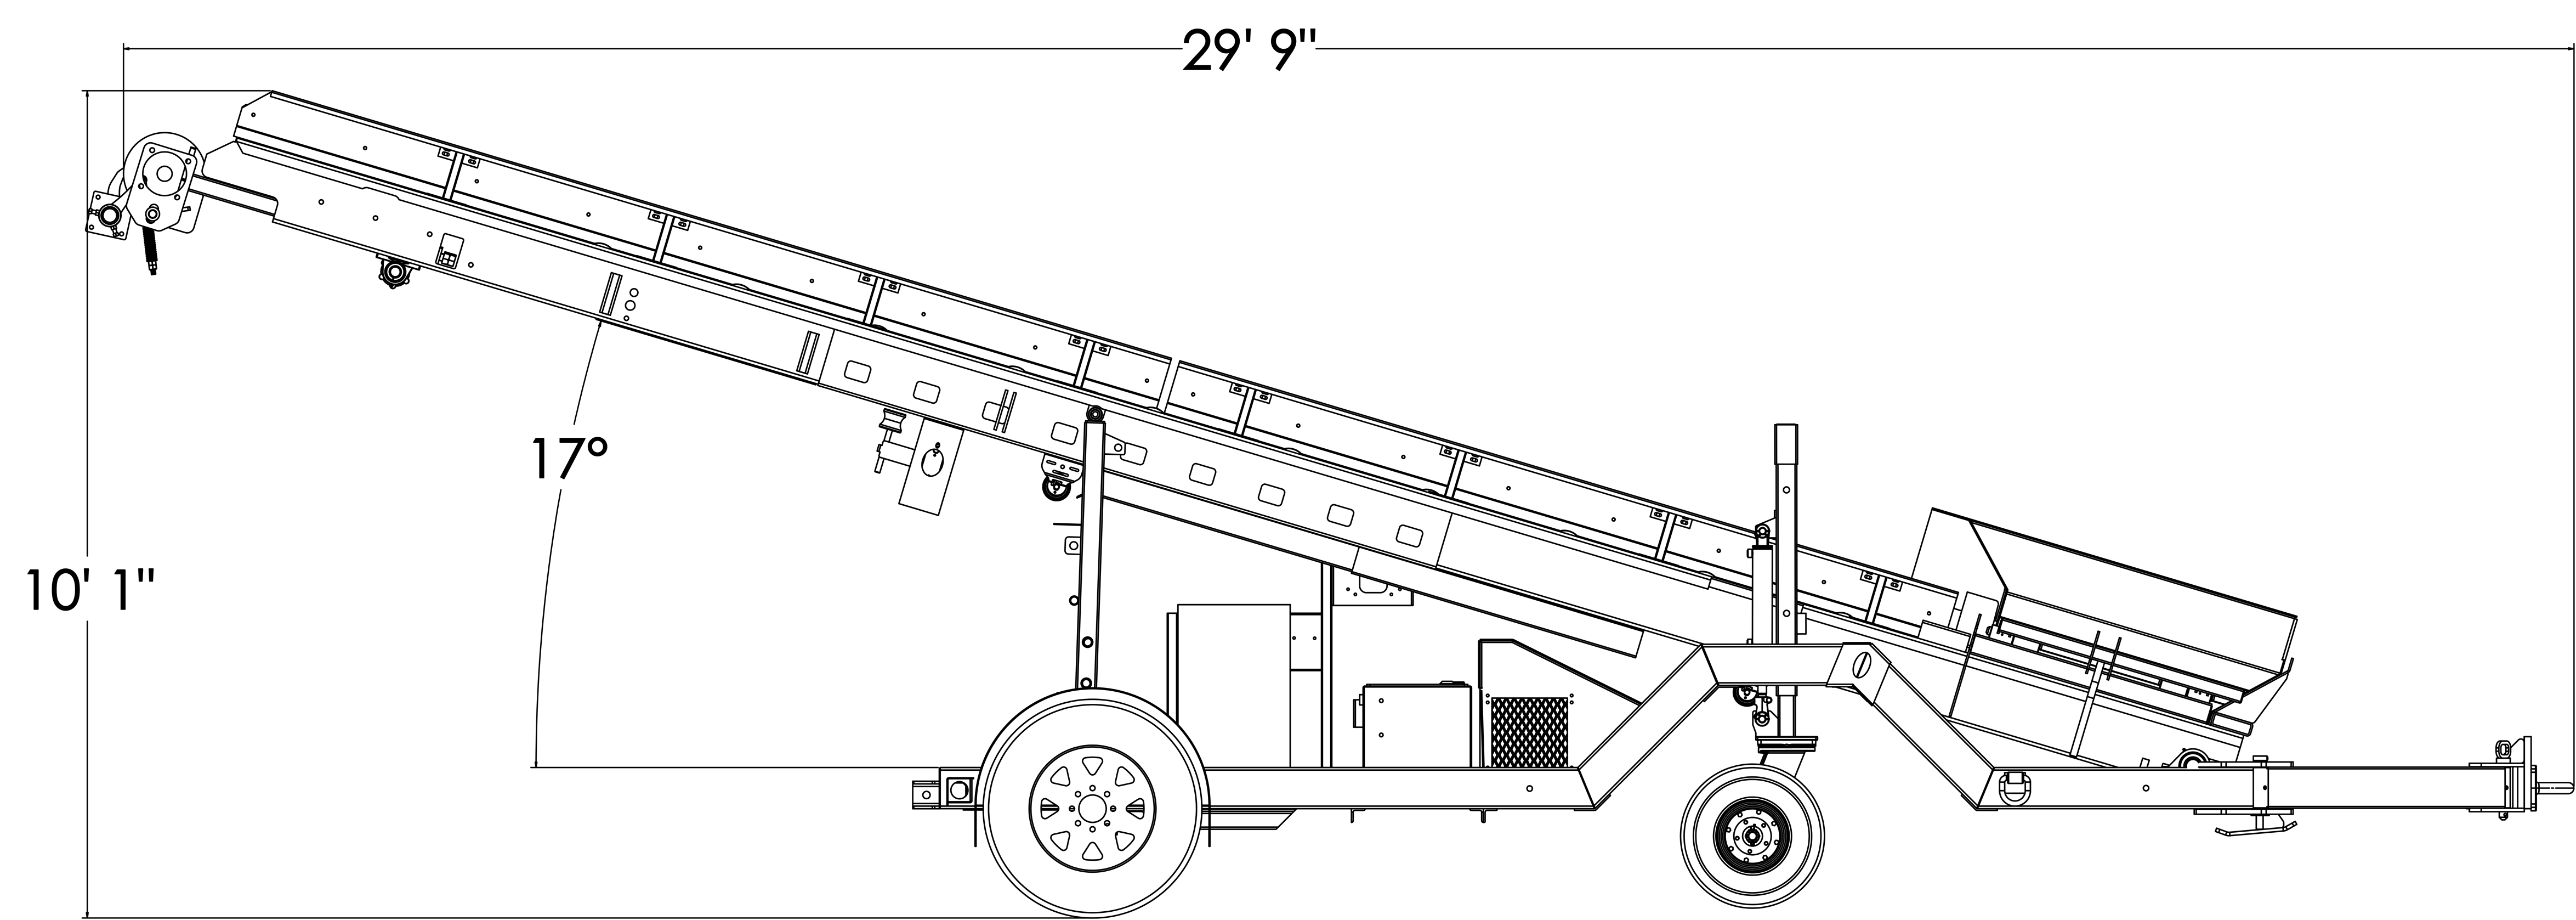 RL26-2